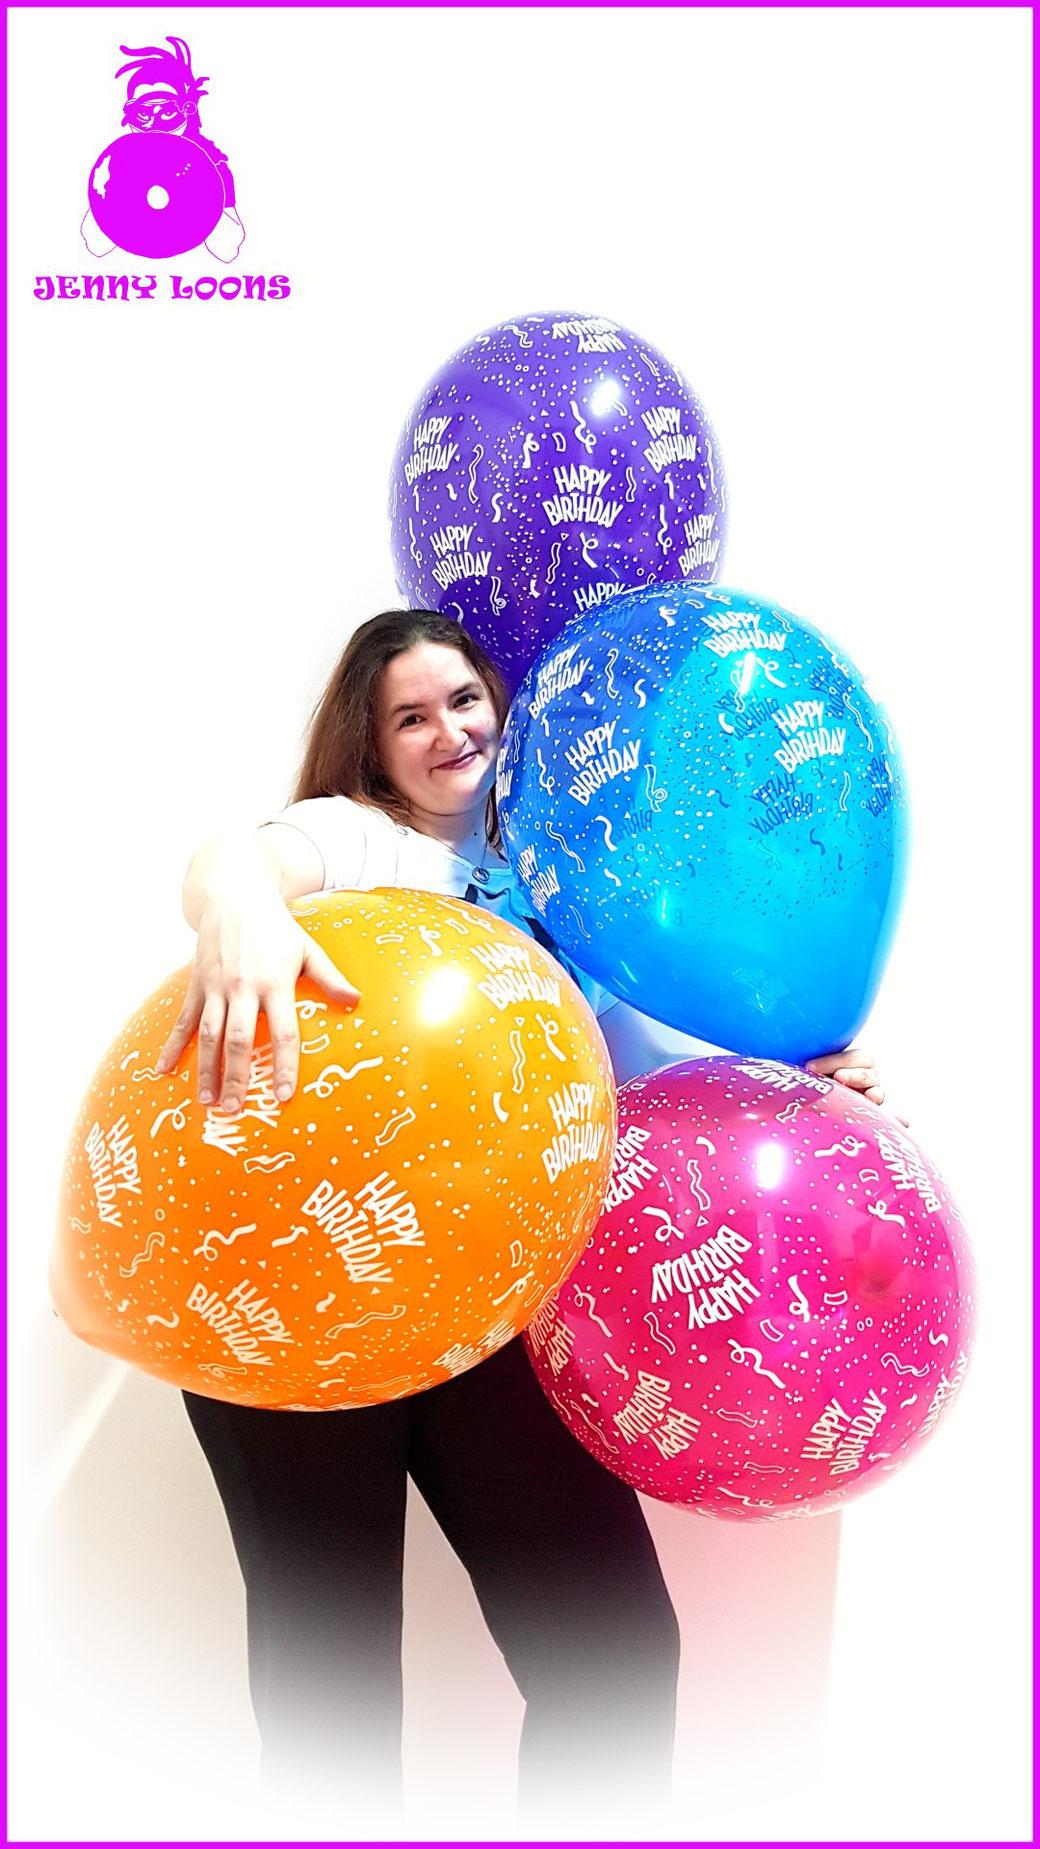 Qualatex Luftballon Ballon Happy Birthday Geburtstag 16inch 40cm pink blau lila purple blue orange Balloon Balloons